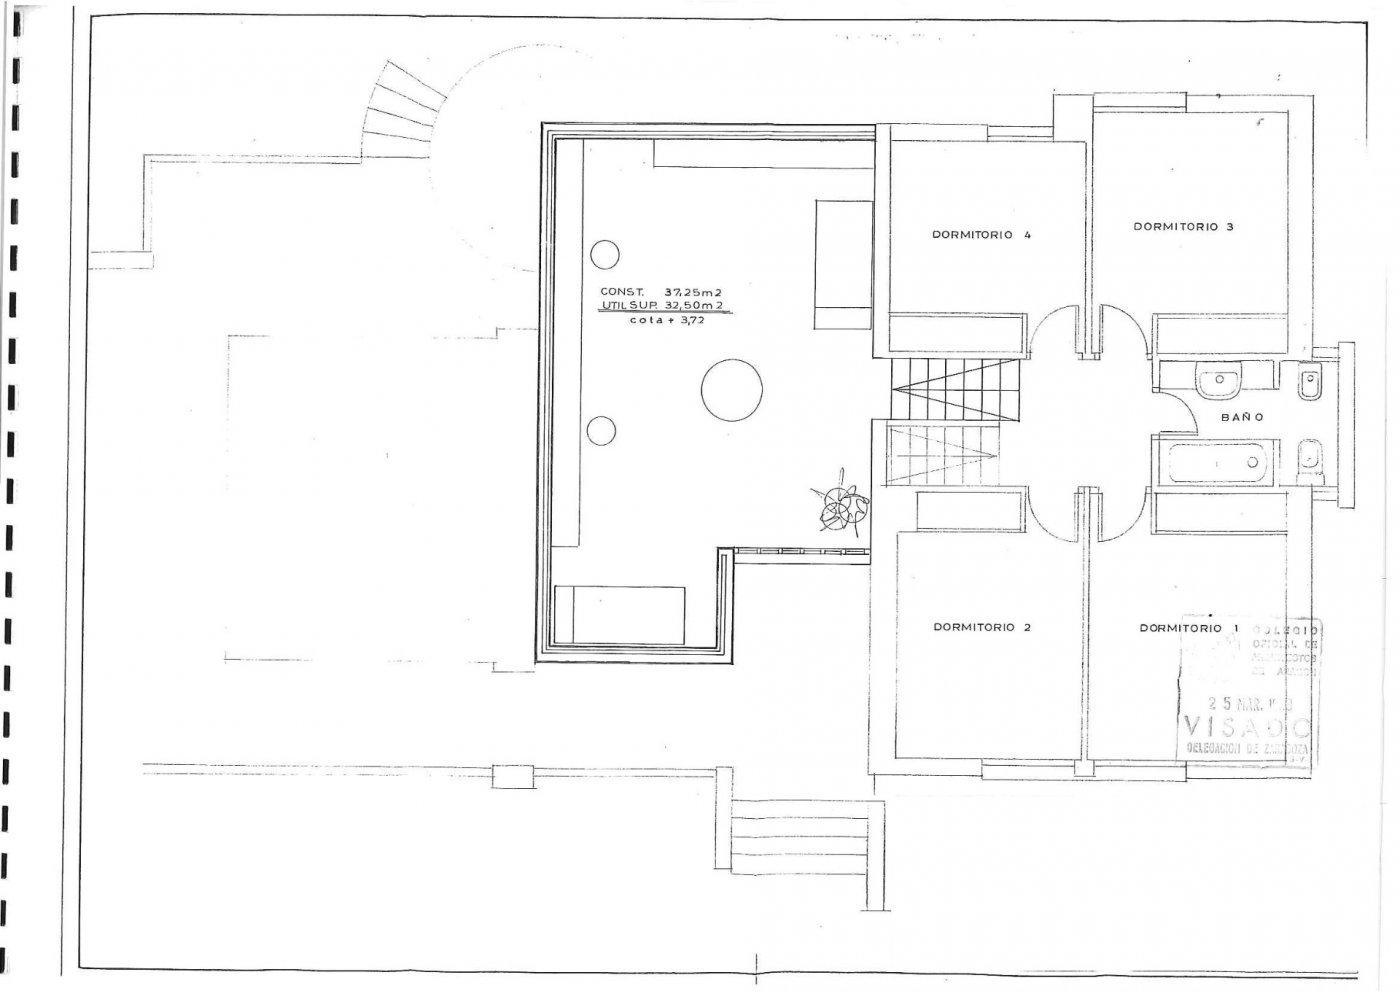 Parcela lateral de 600m2 con casa de 267m2 útiles  de vivienda mas garaje anejo de 45m2 út - imagenInmueble32